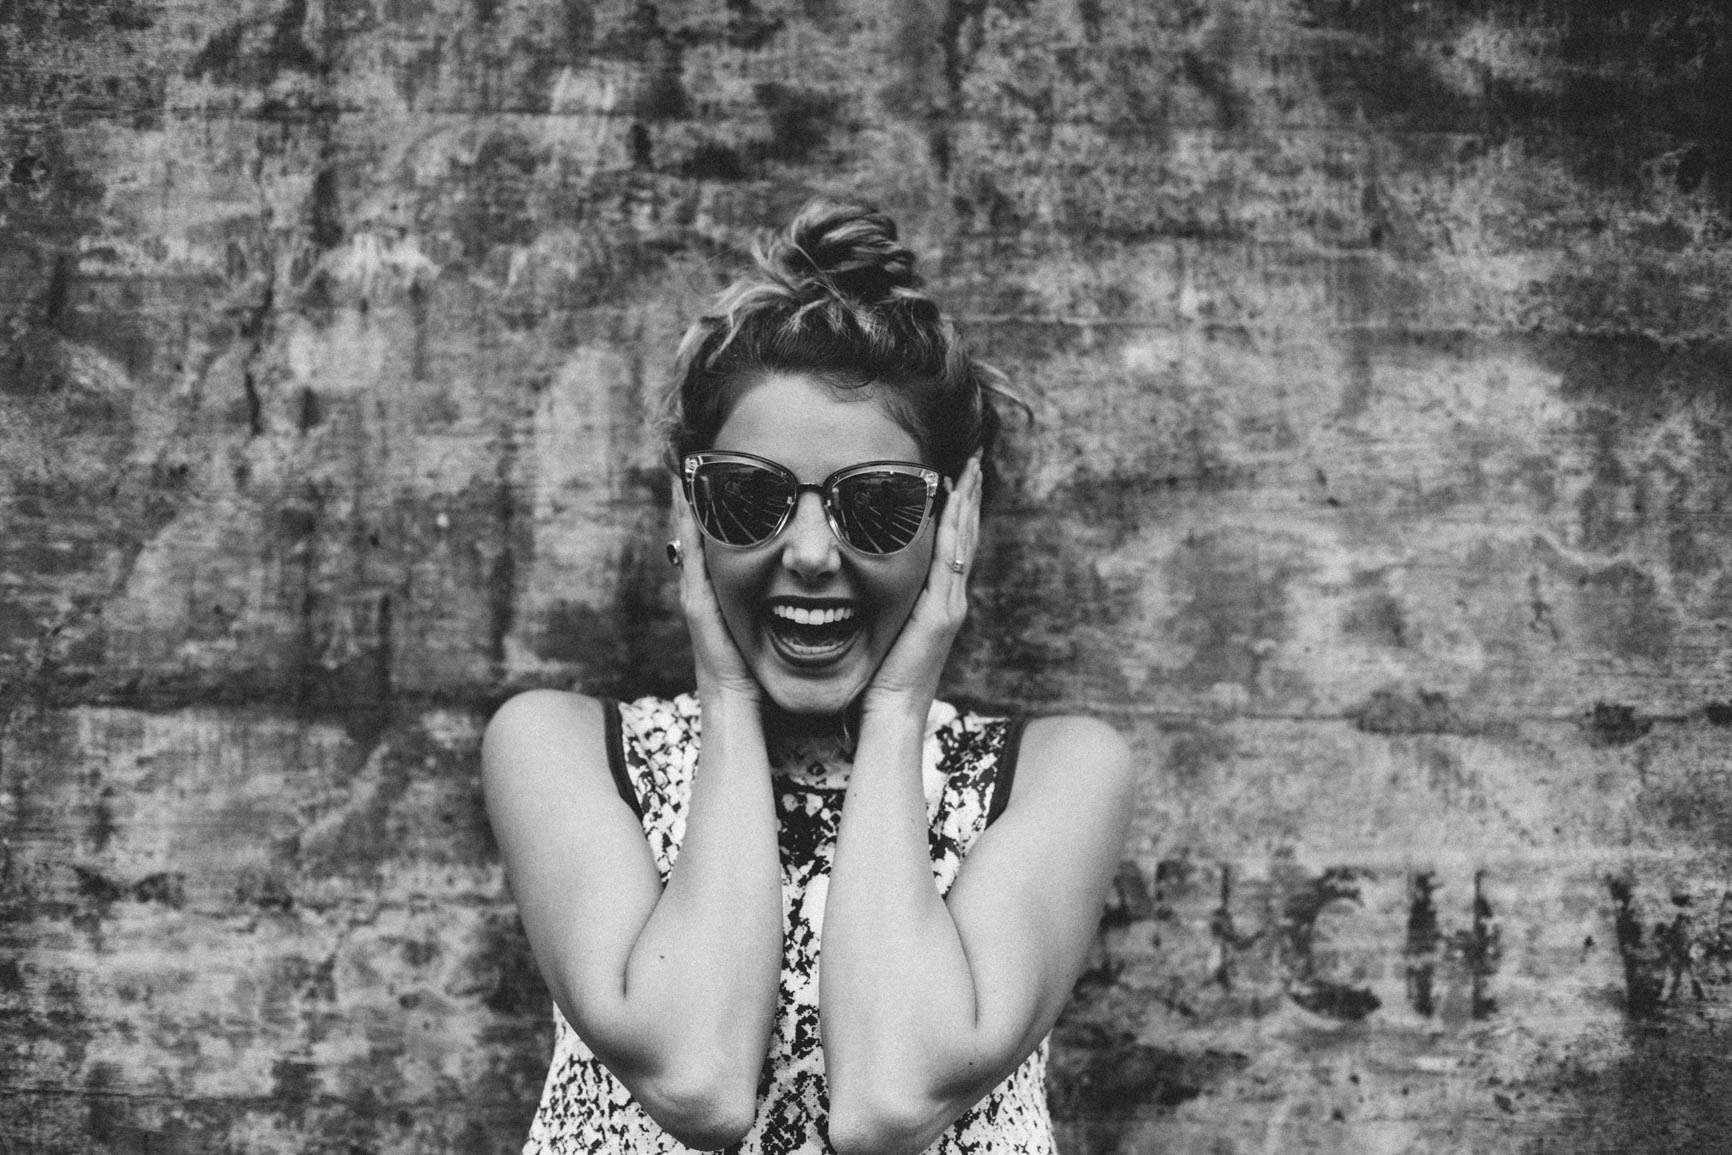 happy-person-by-alli-zimmerman-unsplash-com